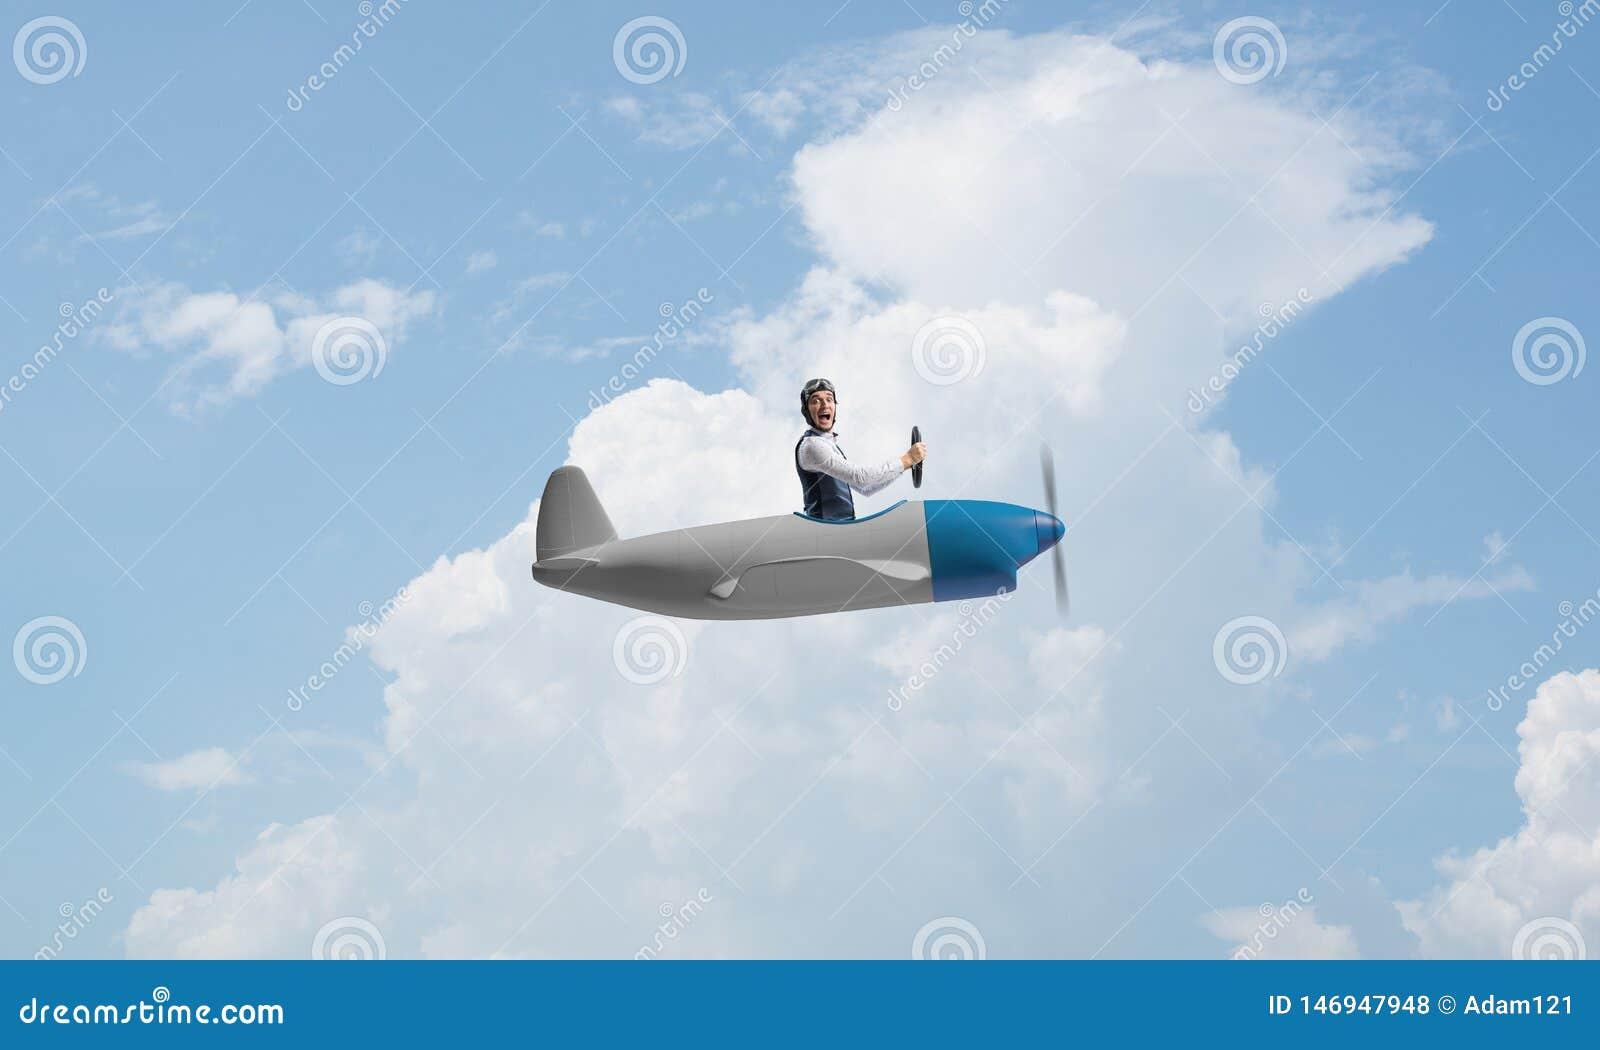 Happy pilot driving small propeller plane